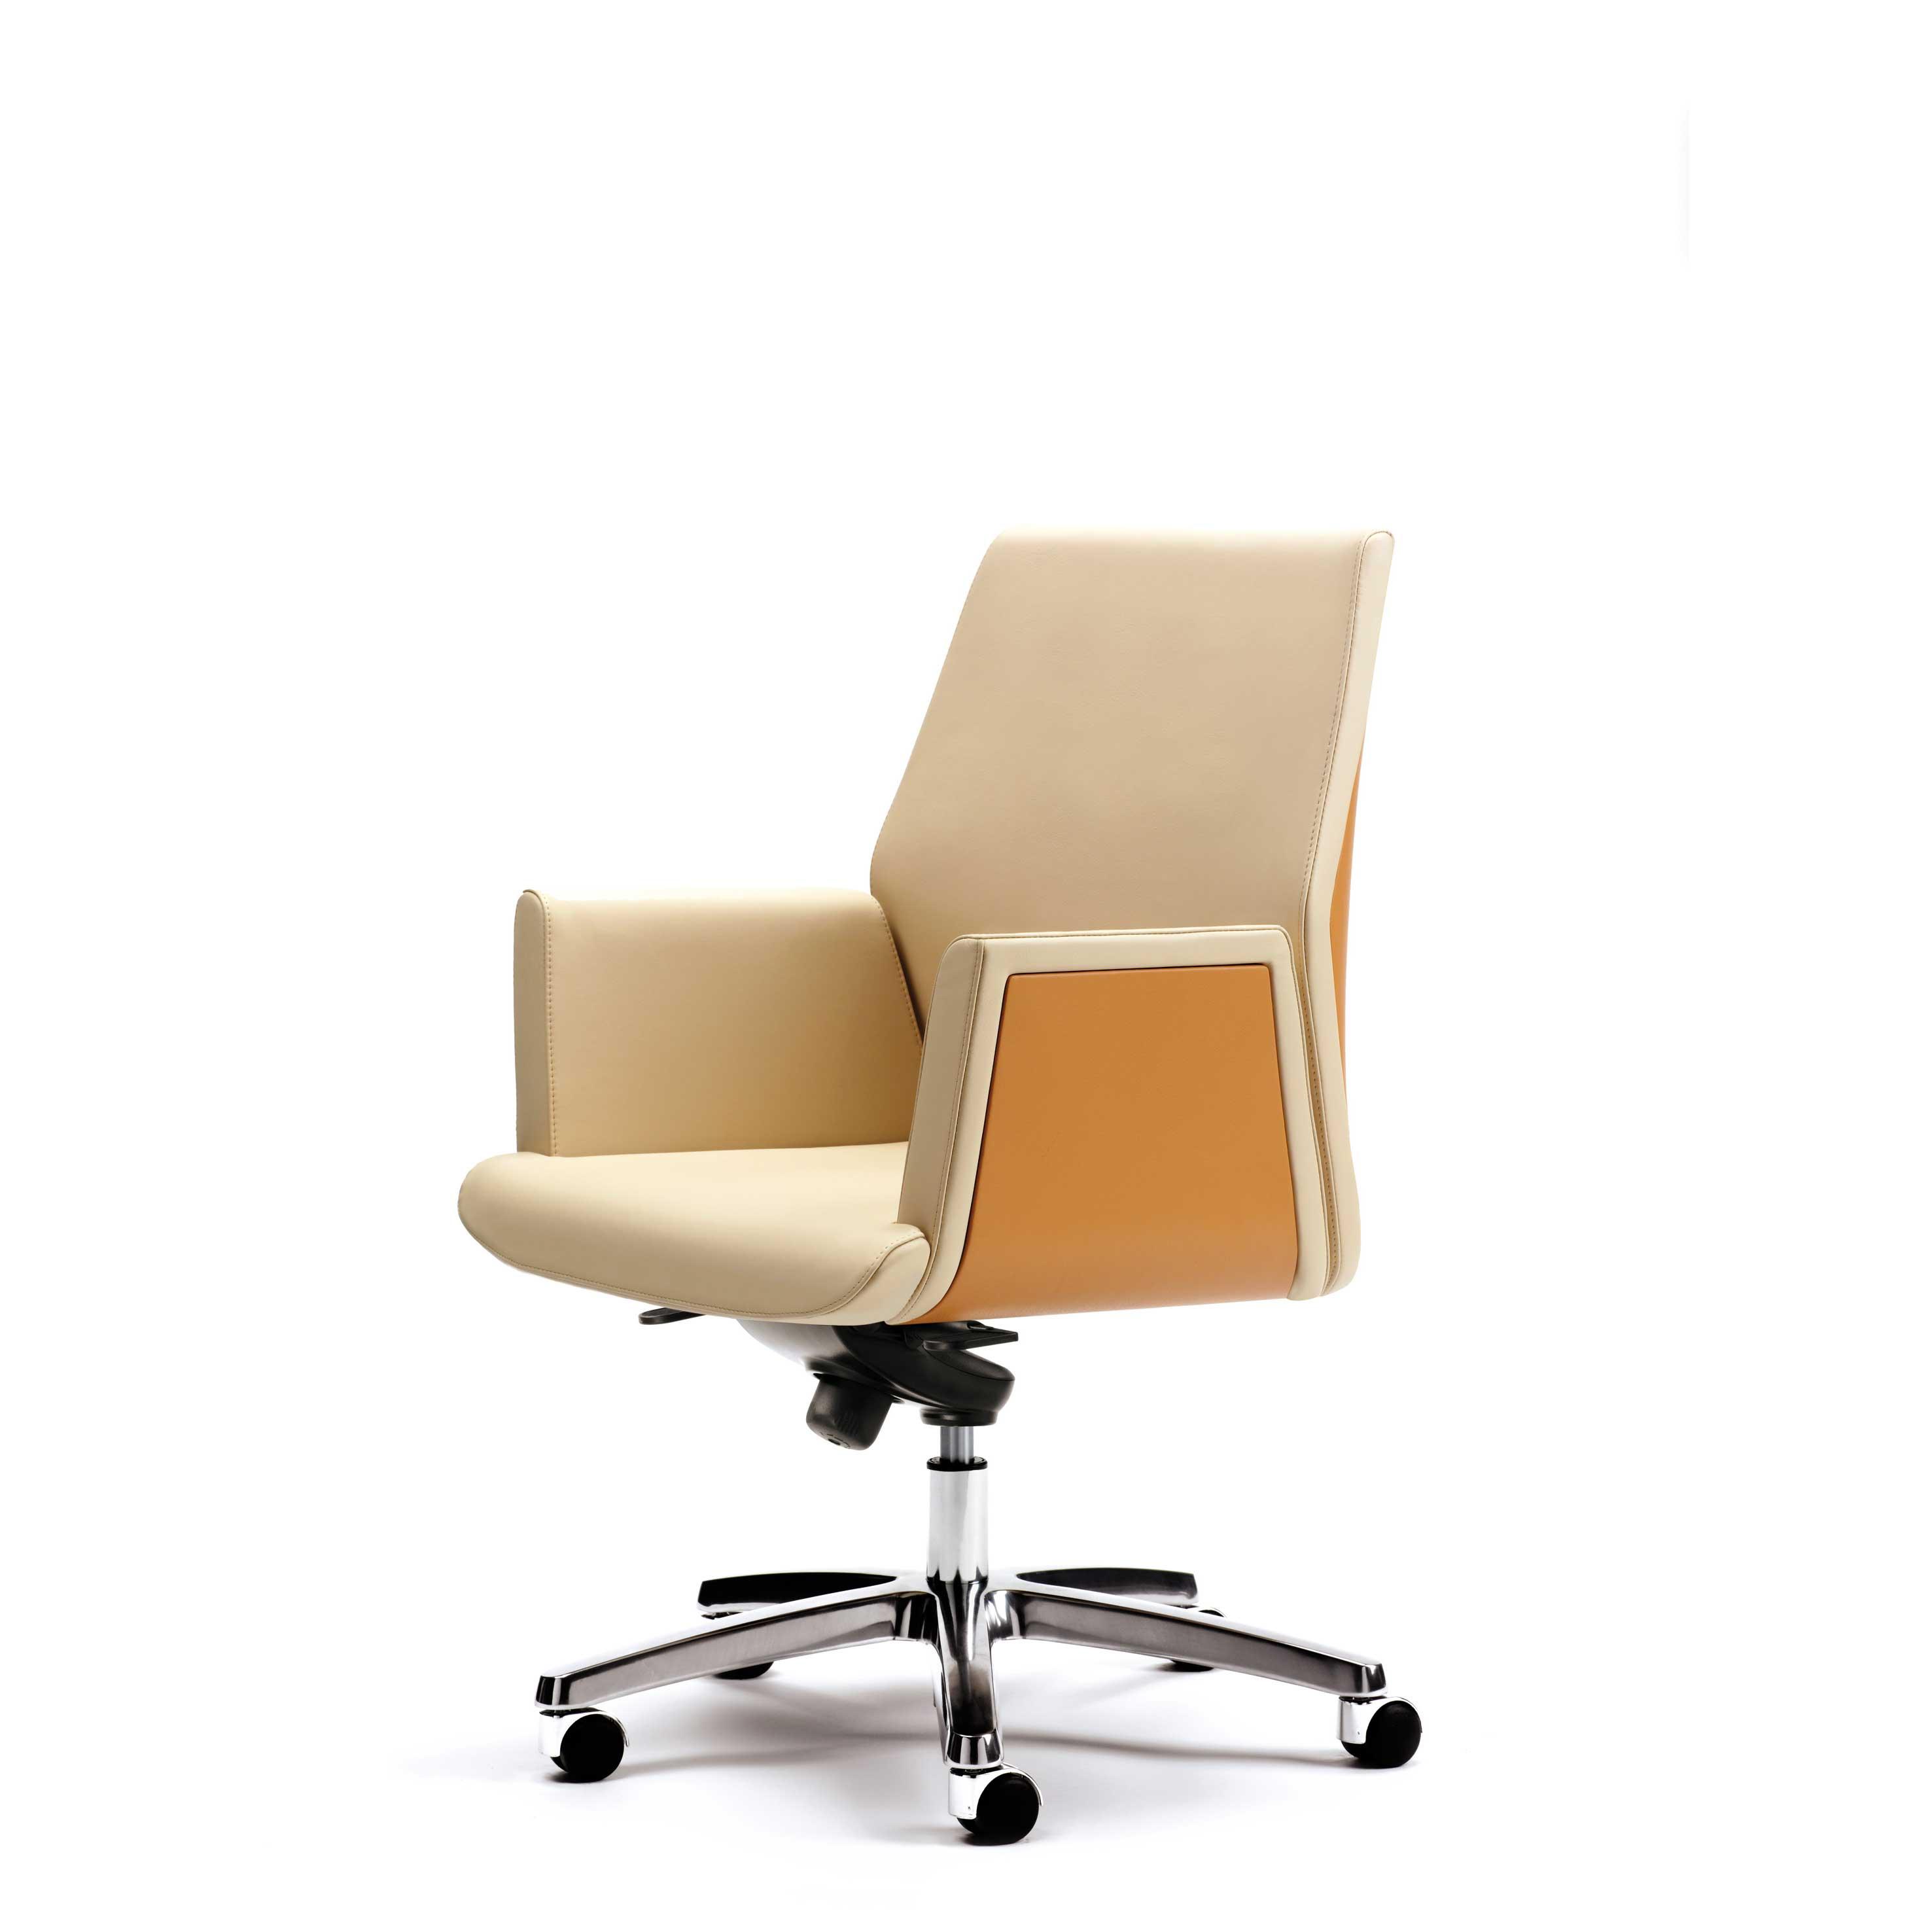 05S_Estel_Comfort&Relax_Office-Chair_Tua